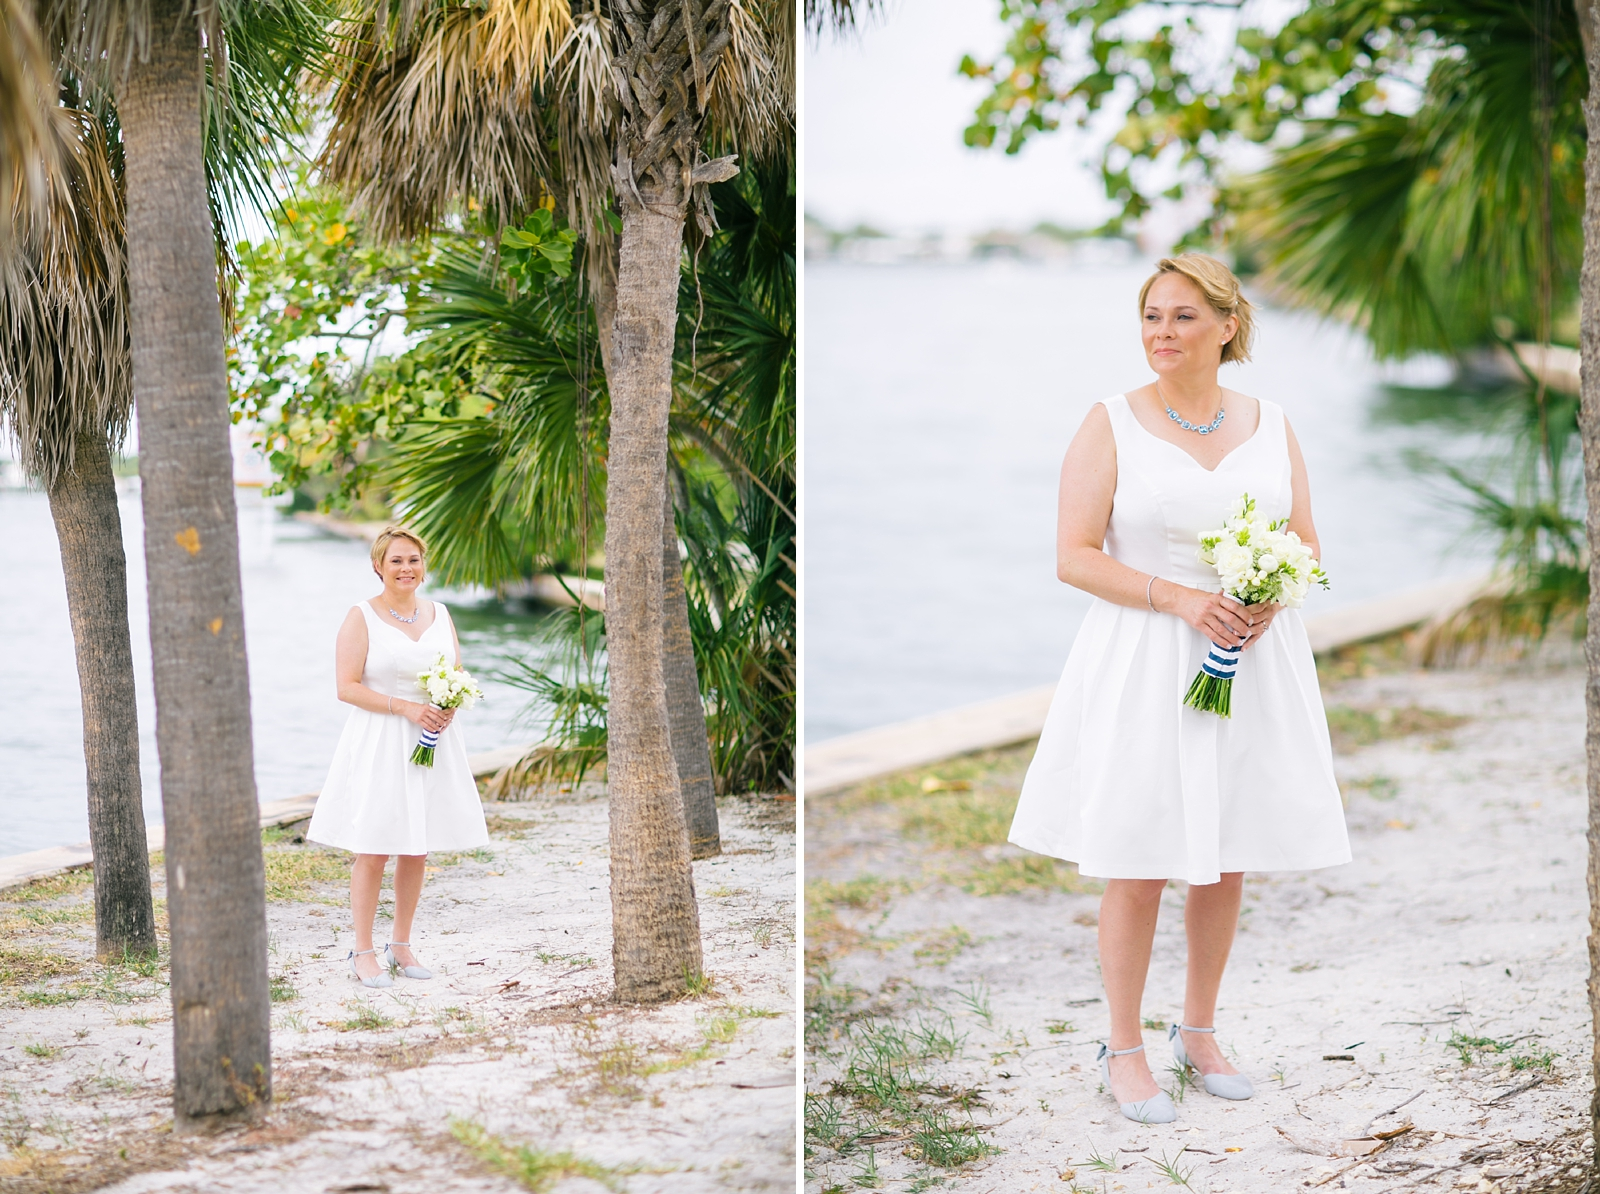 19-los-angeles-wedding-photographer-fort-lauderdale.jpg